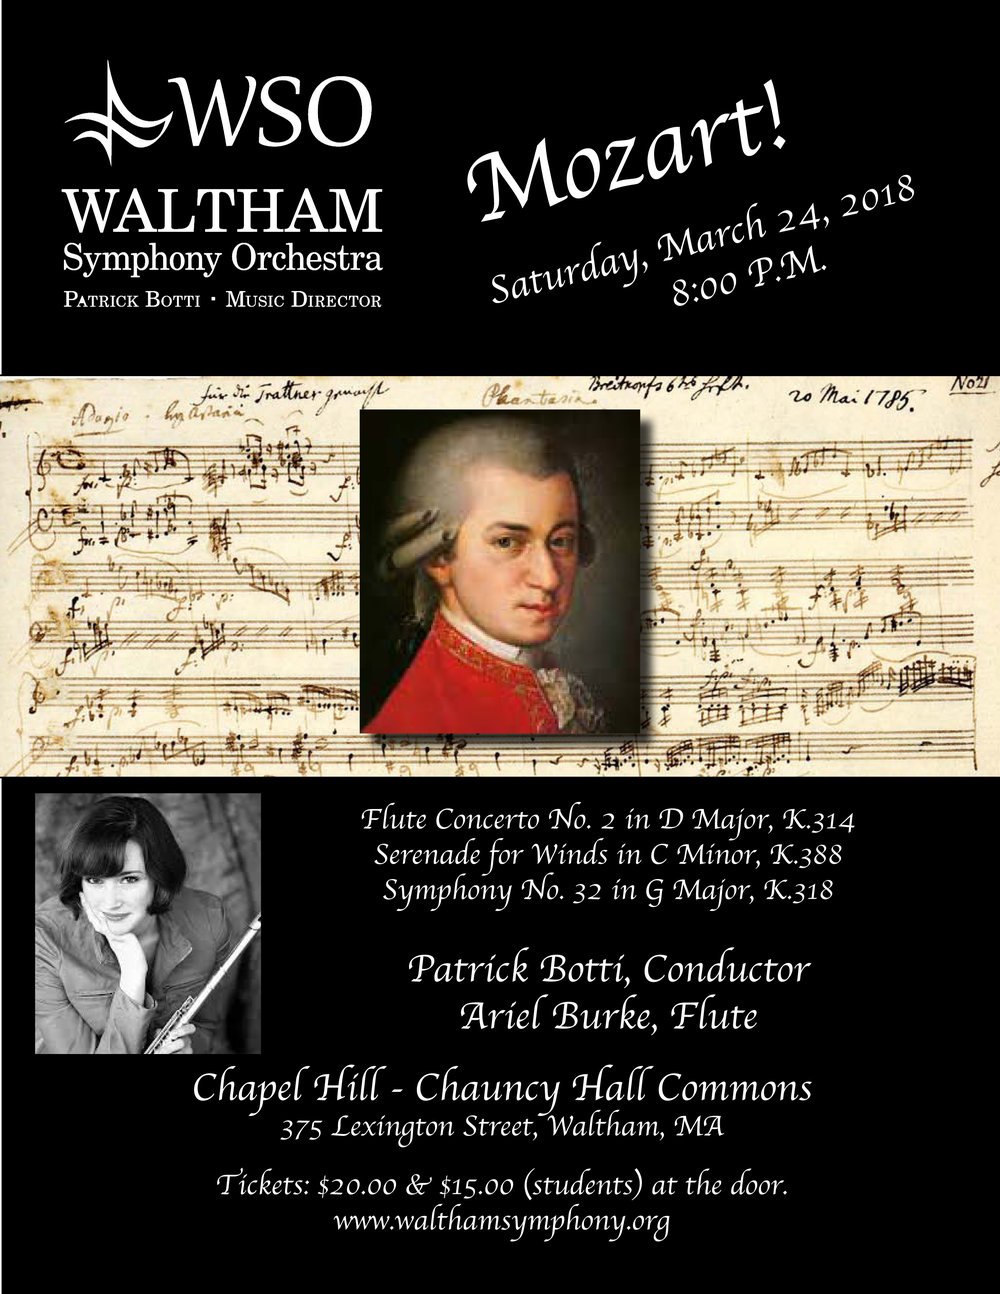 The WSO will perform music by Mozart under the baton of WSO Music Director Patrick Botti. Featuring WSO principal flutist, Arielle Burke.